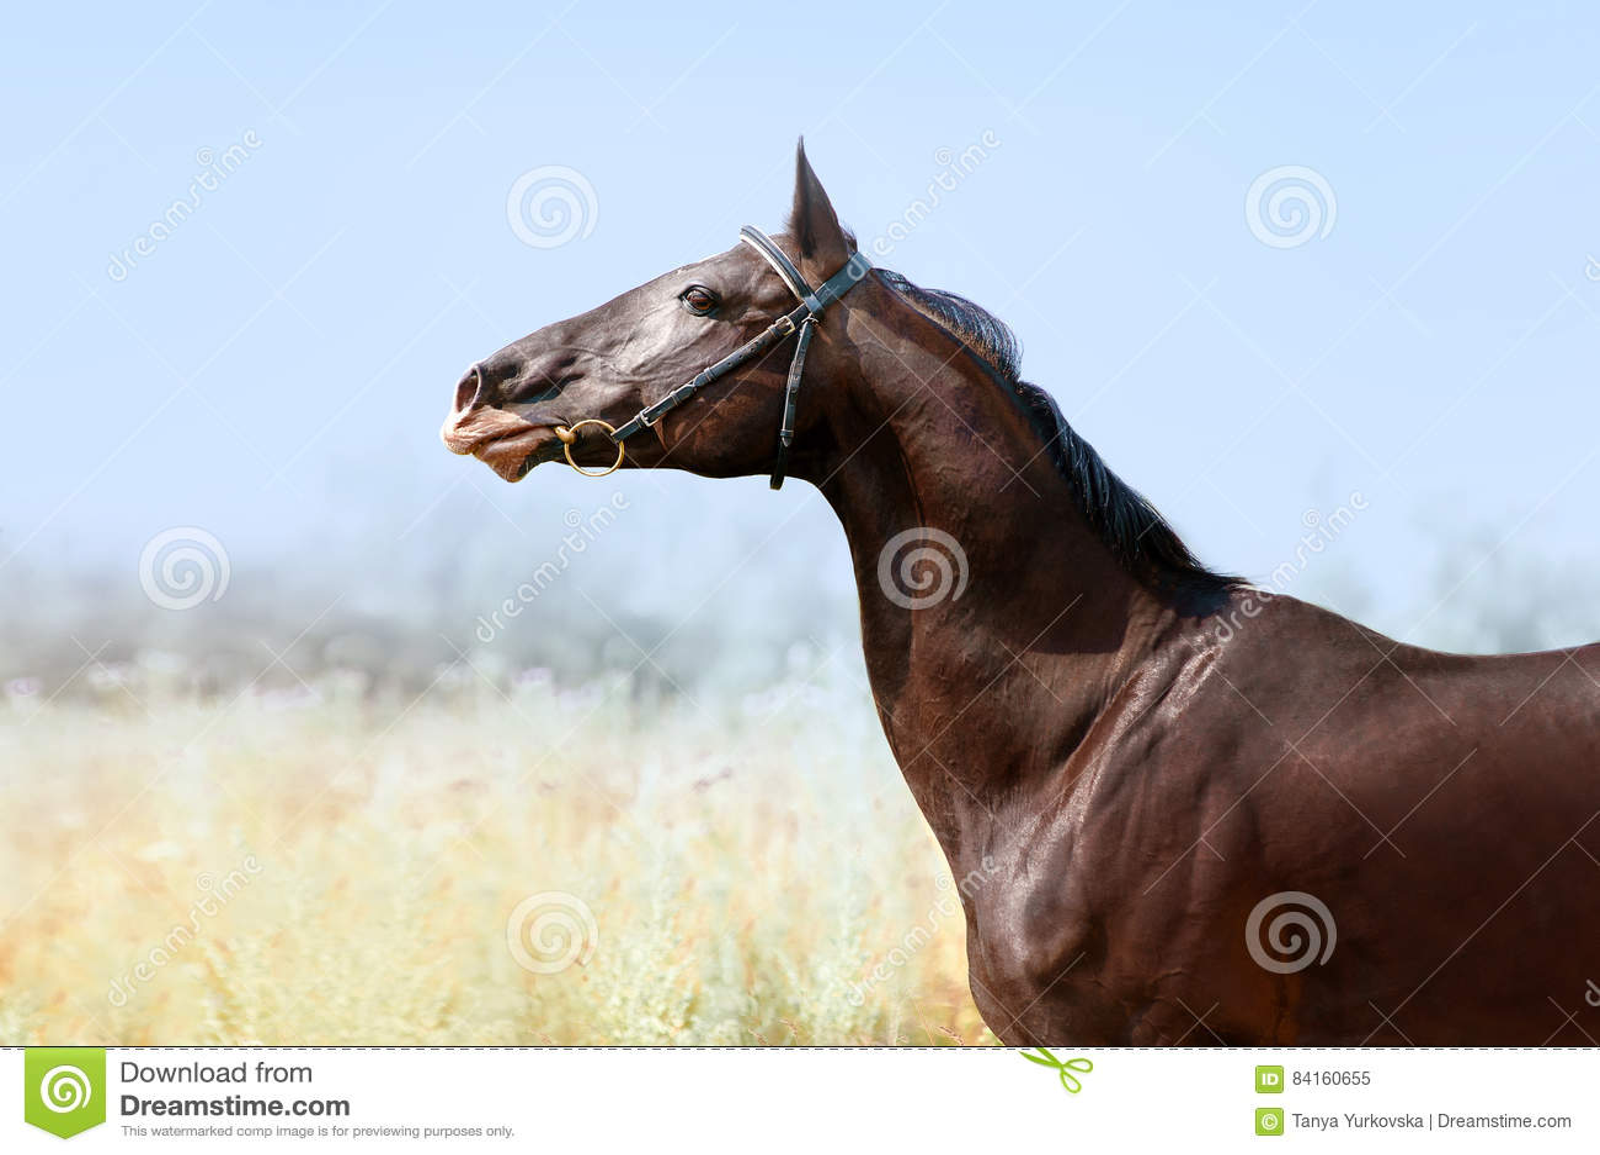 Beautiful portrait of a Akhal-Teke horse